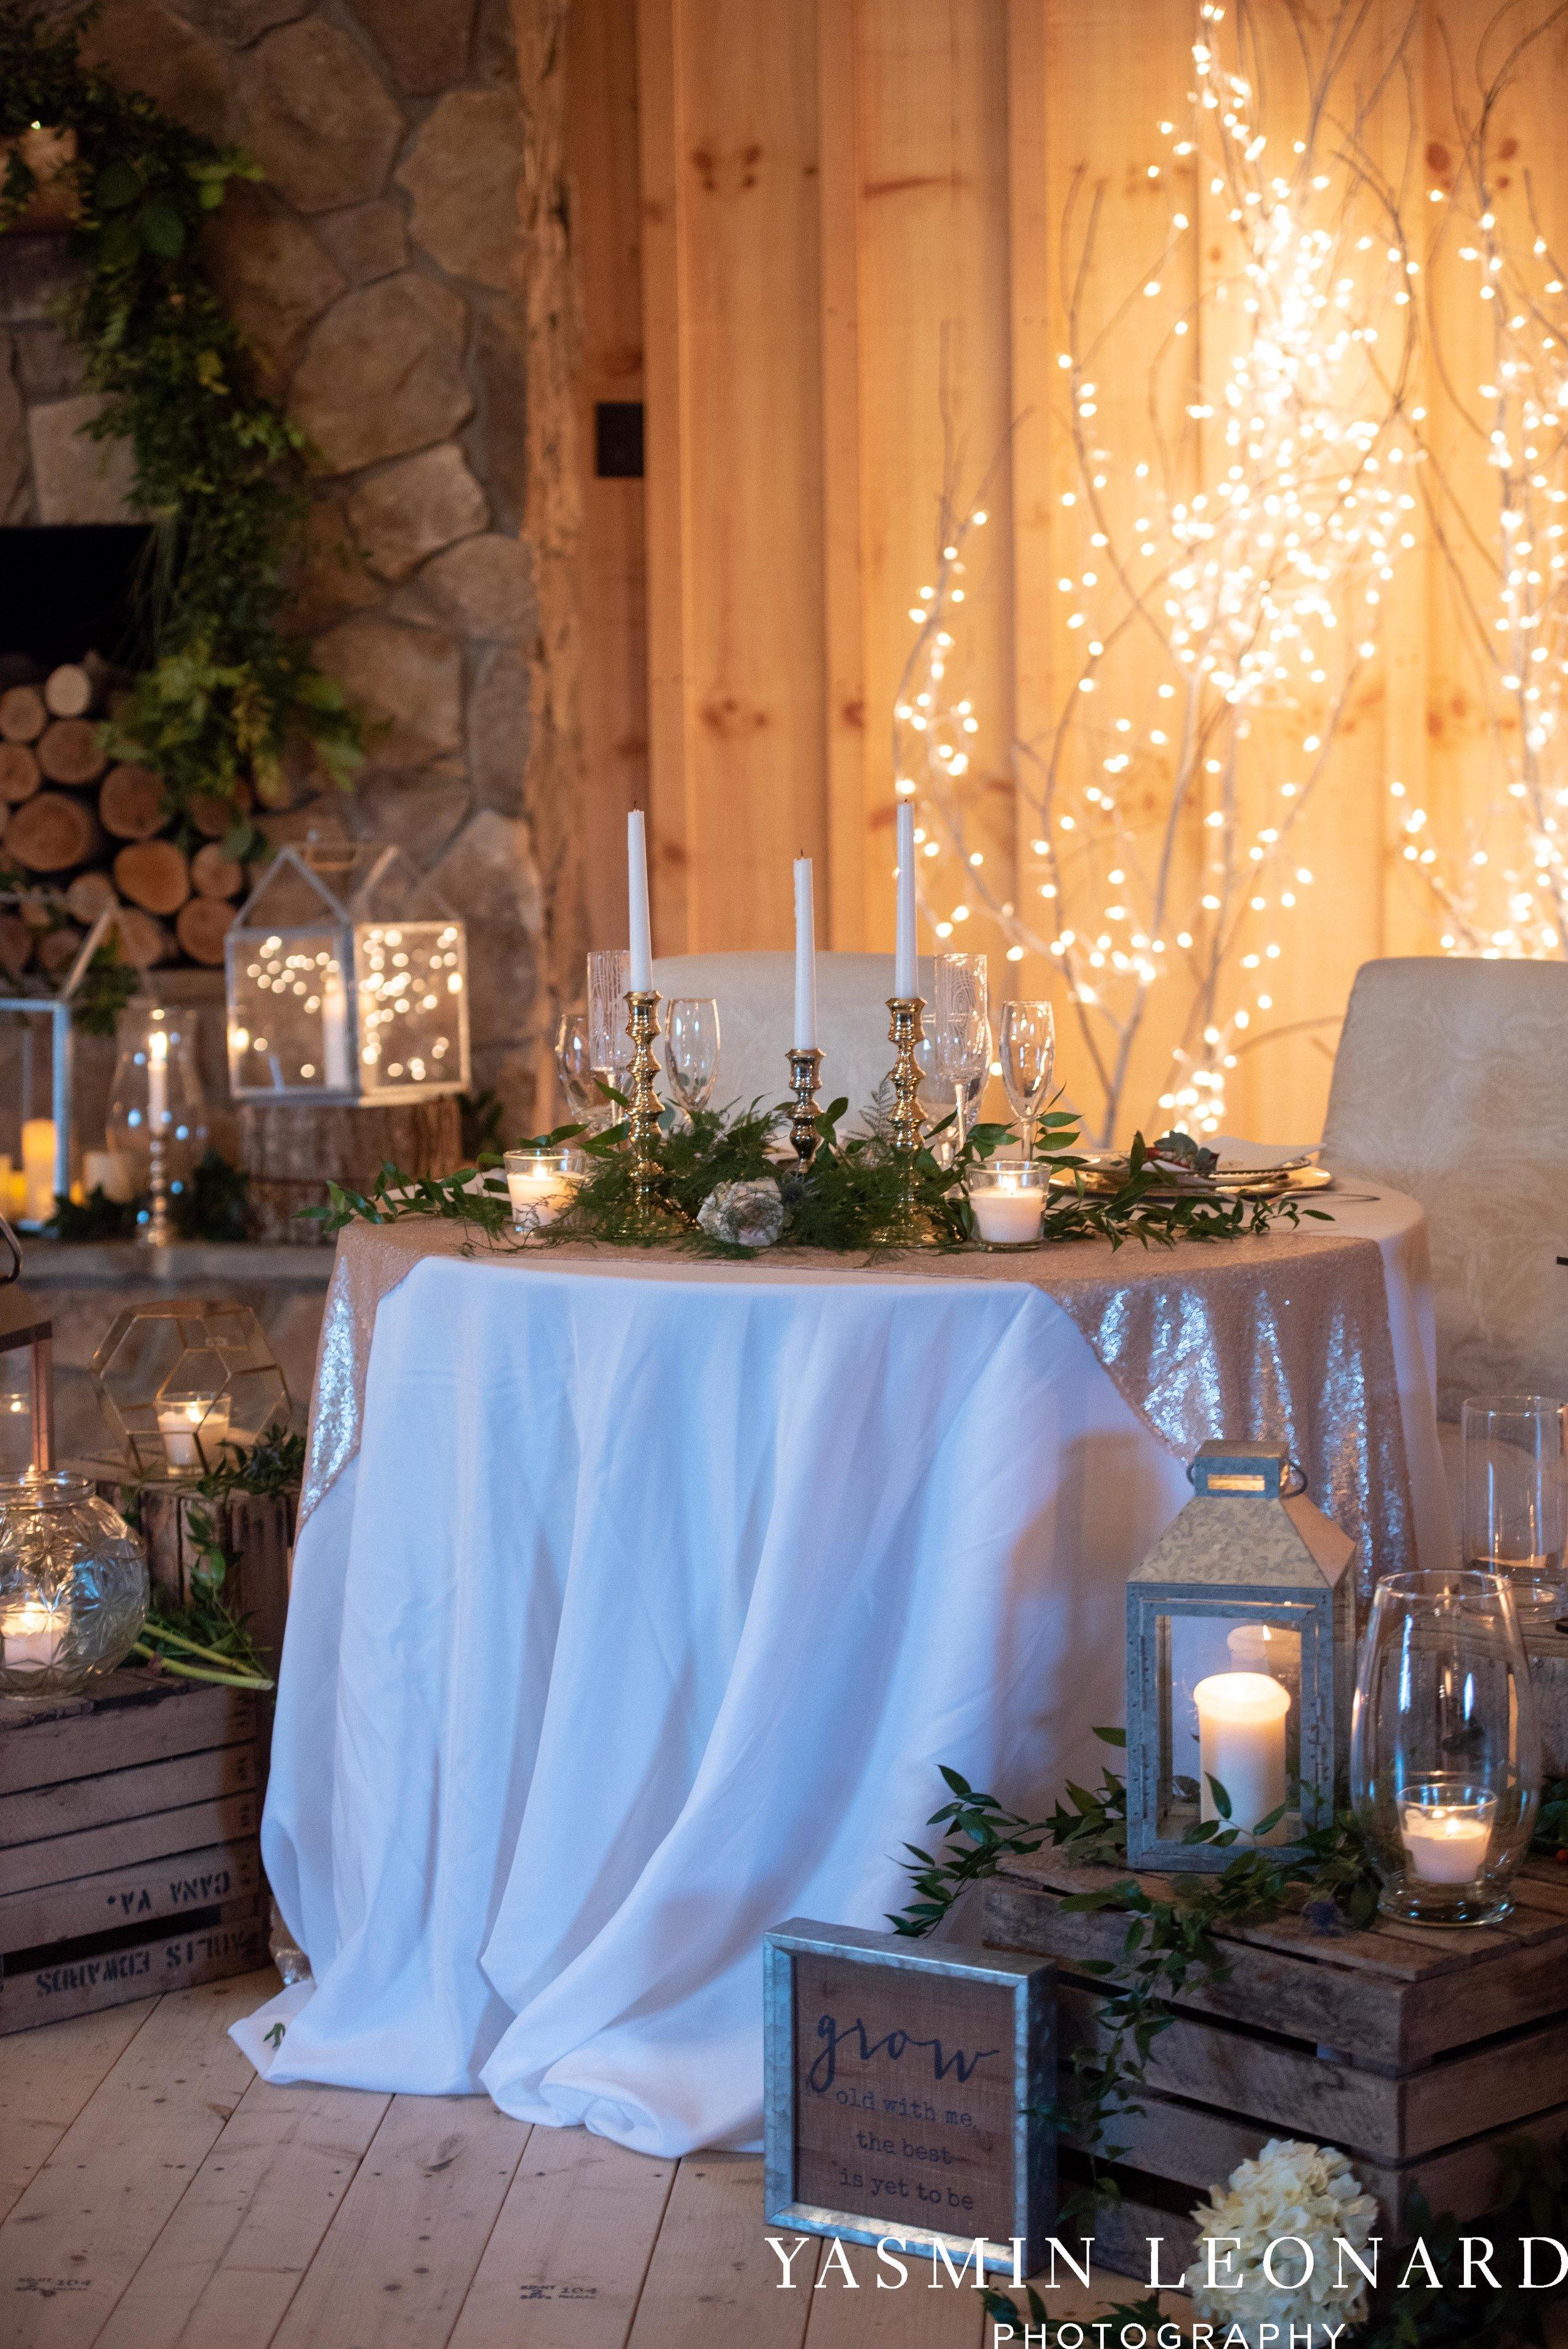 Wesley Memorial United Methodist Church - Old Homeplace Winery - High Point Weddings - High Point Wedding Photographer - NC Weddings - NC Barn Venue - Yasmin Leonard Photography-59.jpg